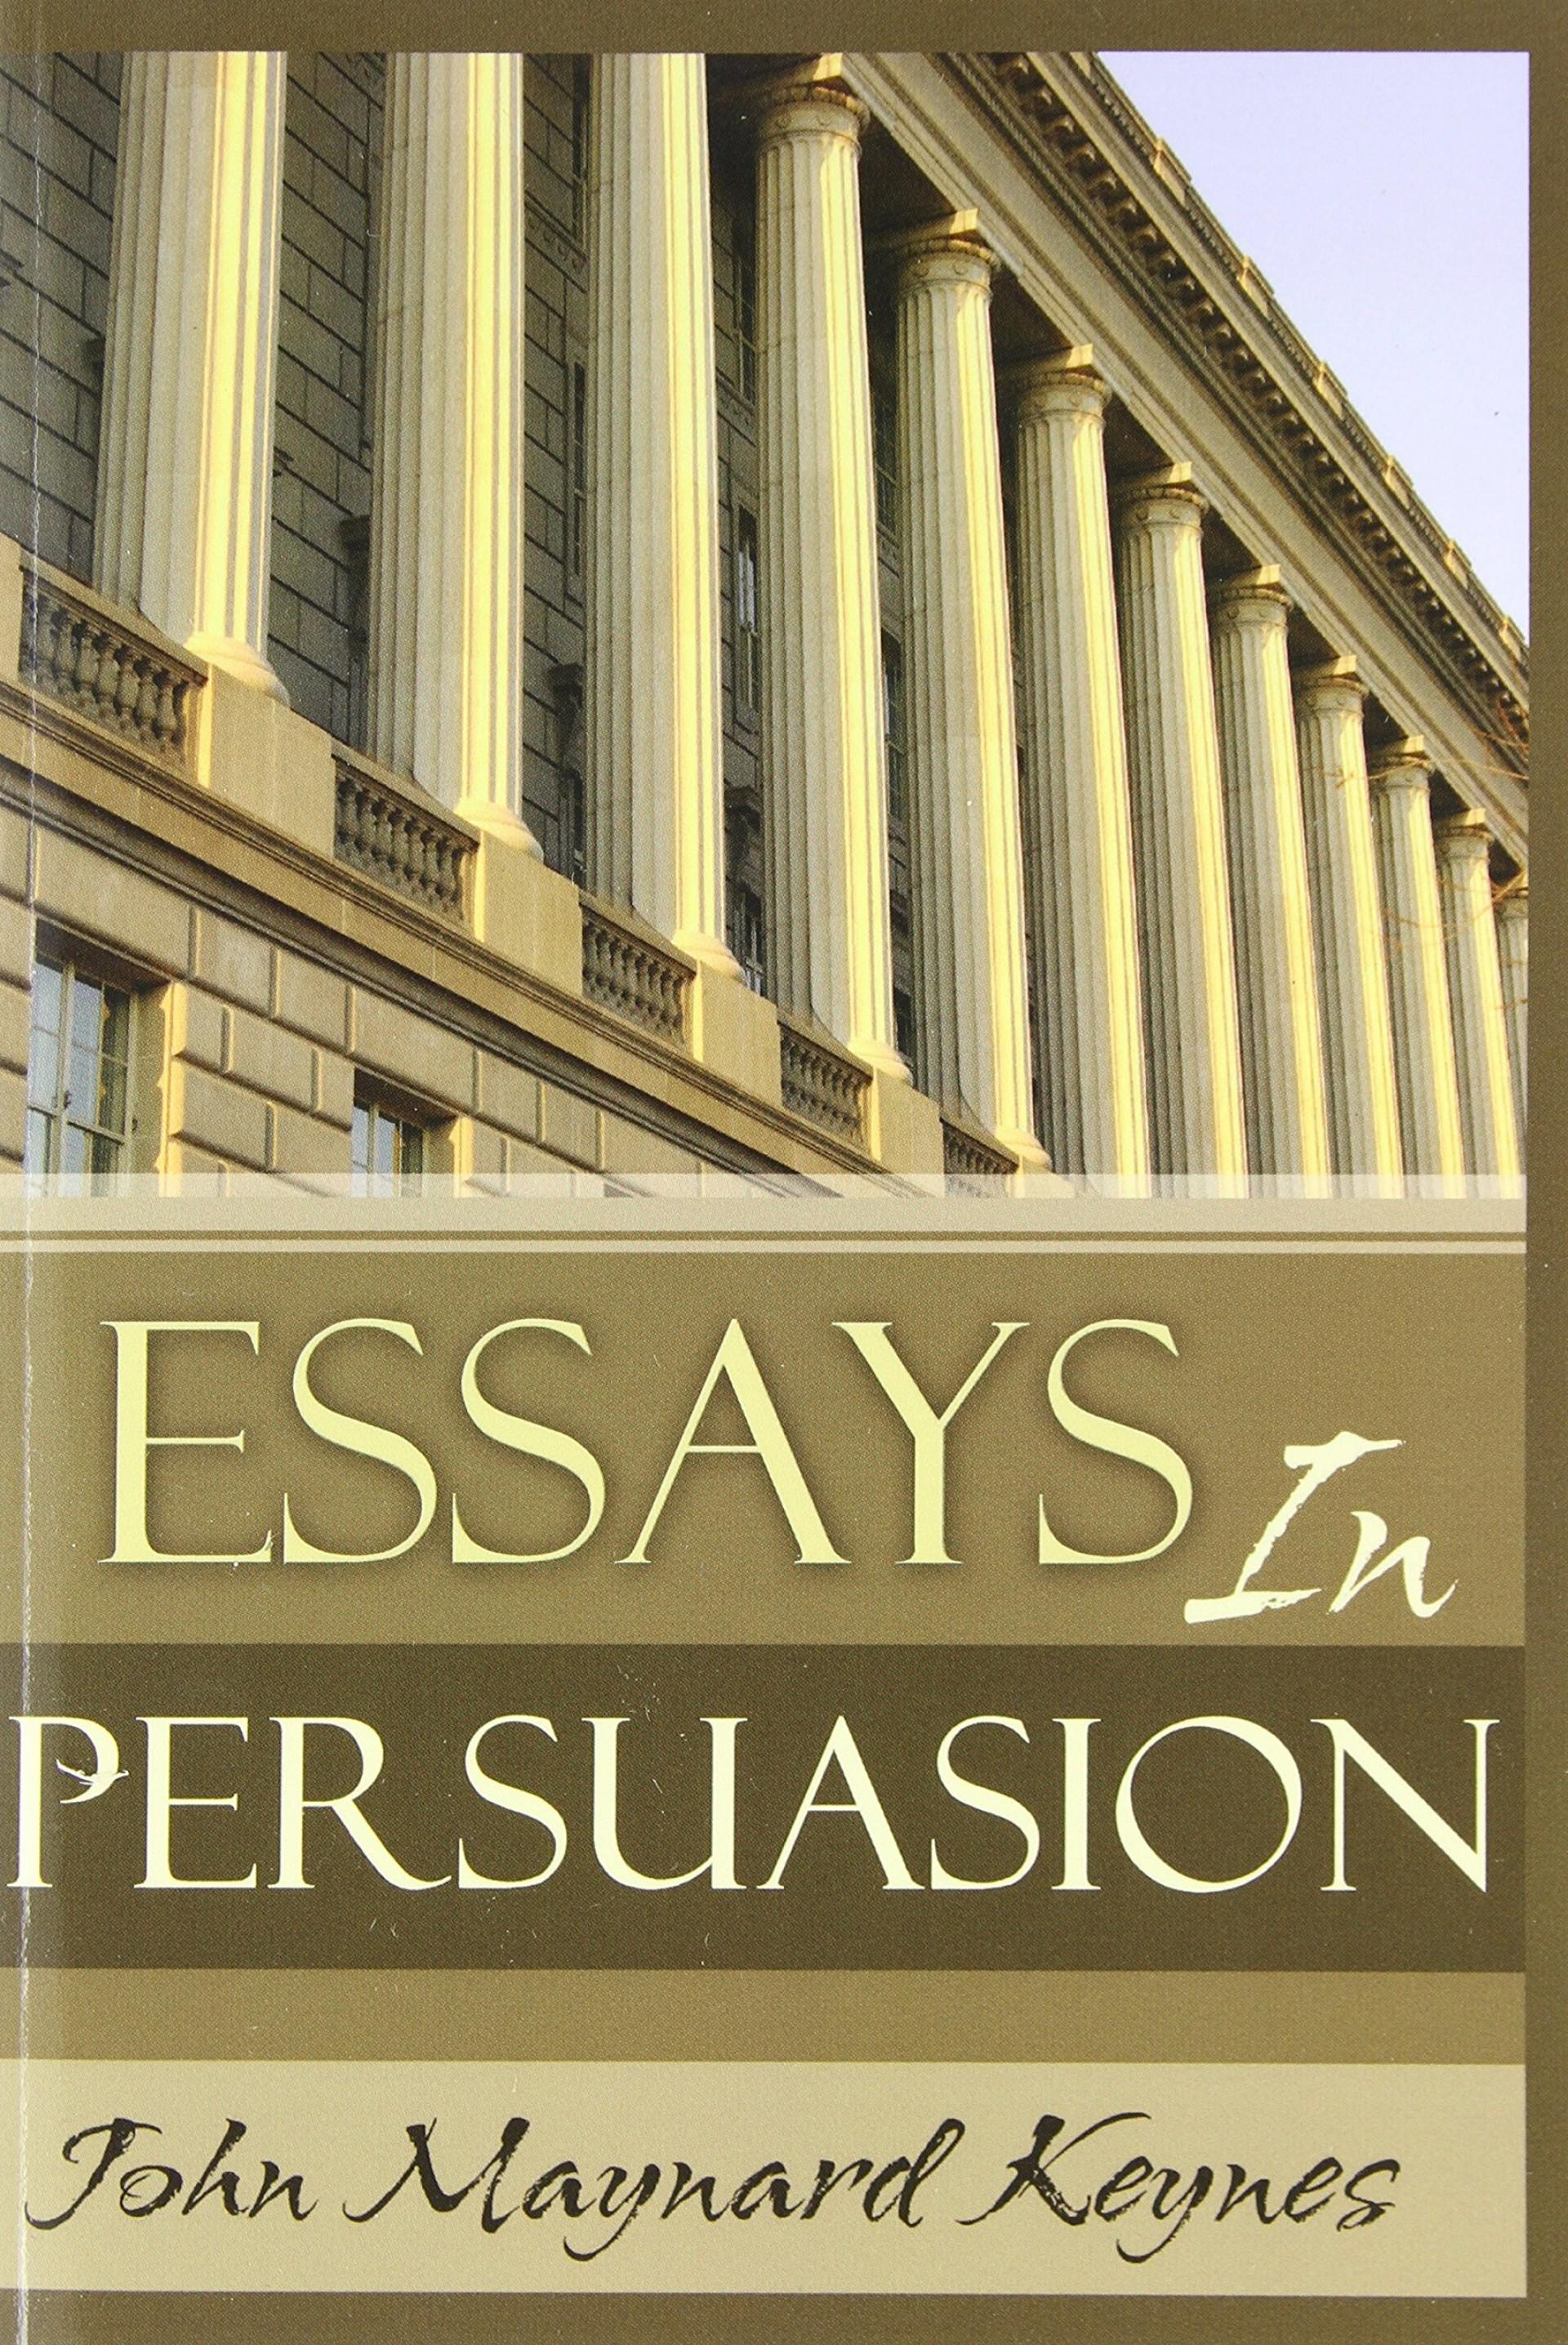 001 Essay Example A1hzb1u2bixl Essays In Remarkable Persuasion Audiobook Pdf John Maynard Keynes Summary 1920